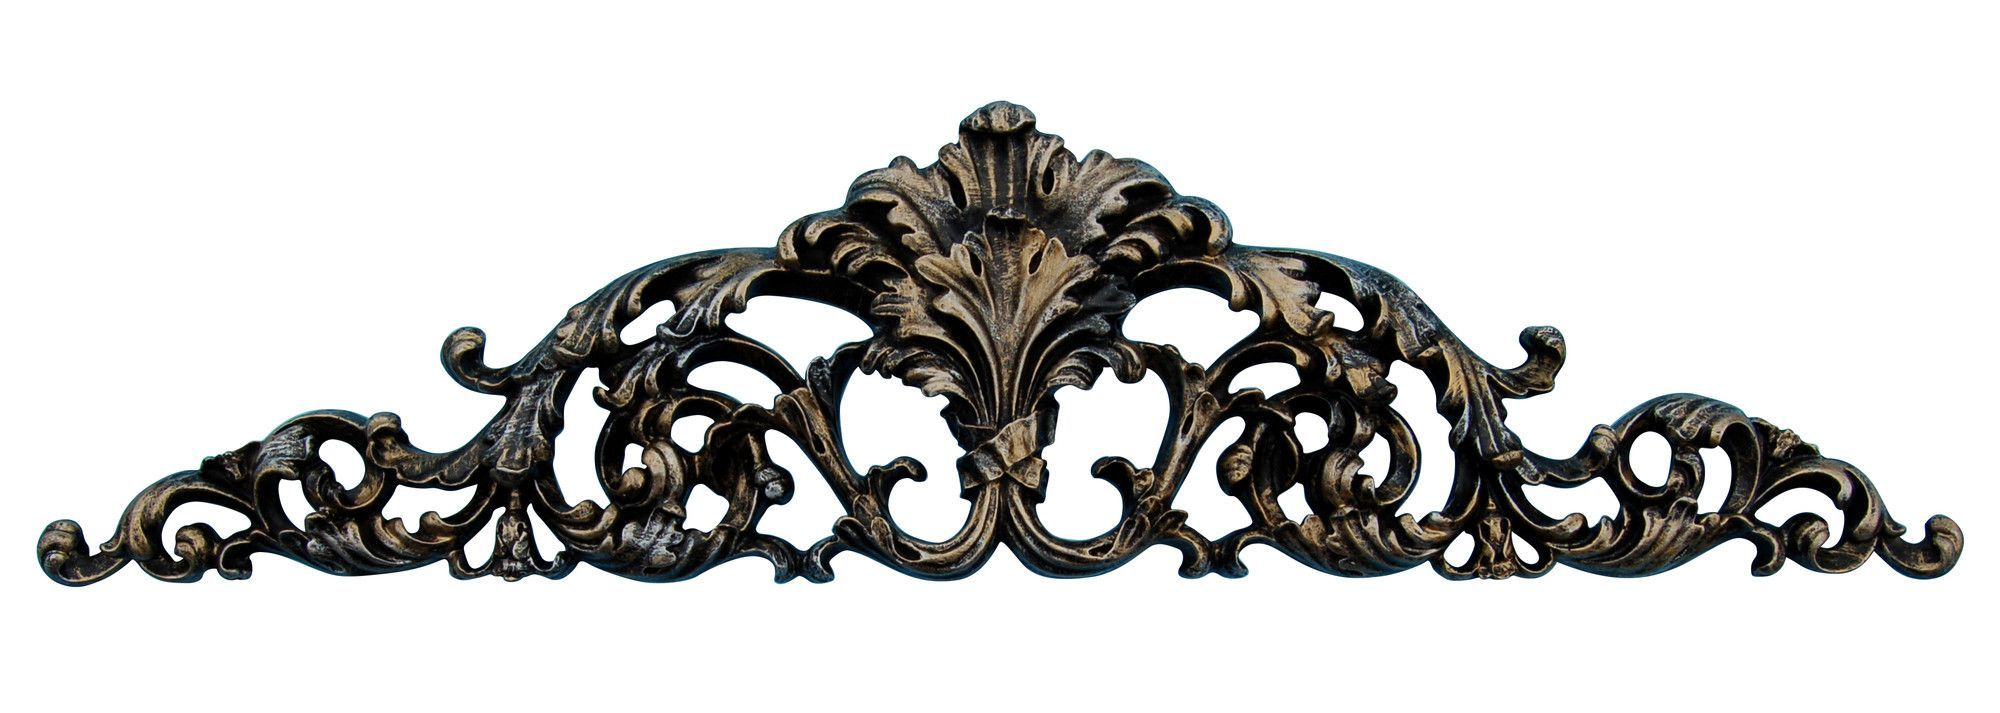 Acanthus Open Leaf Overdoor Wall Décor | Products | Pinterest ...